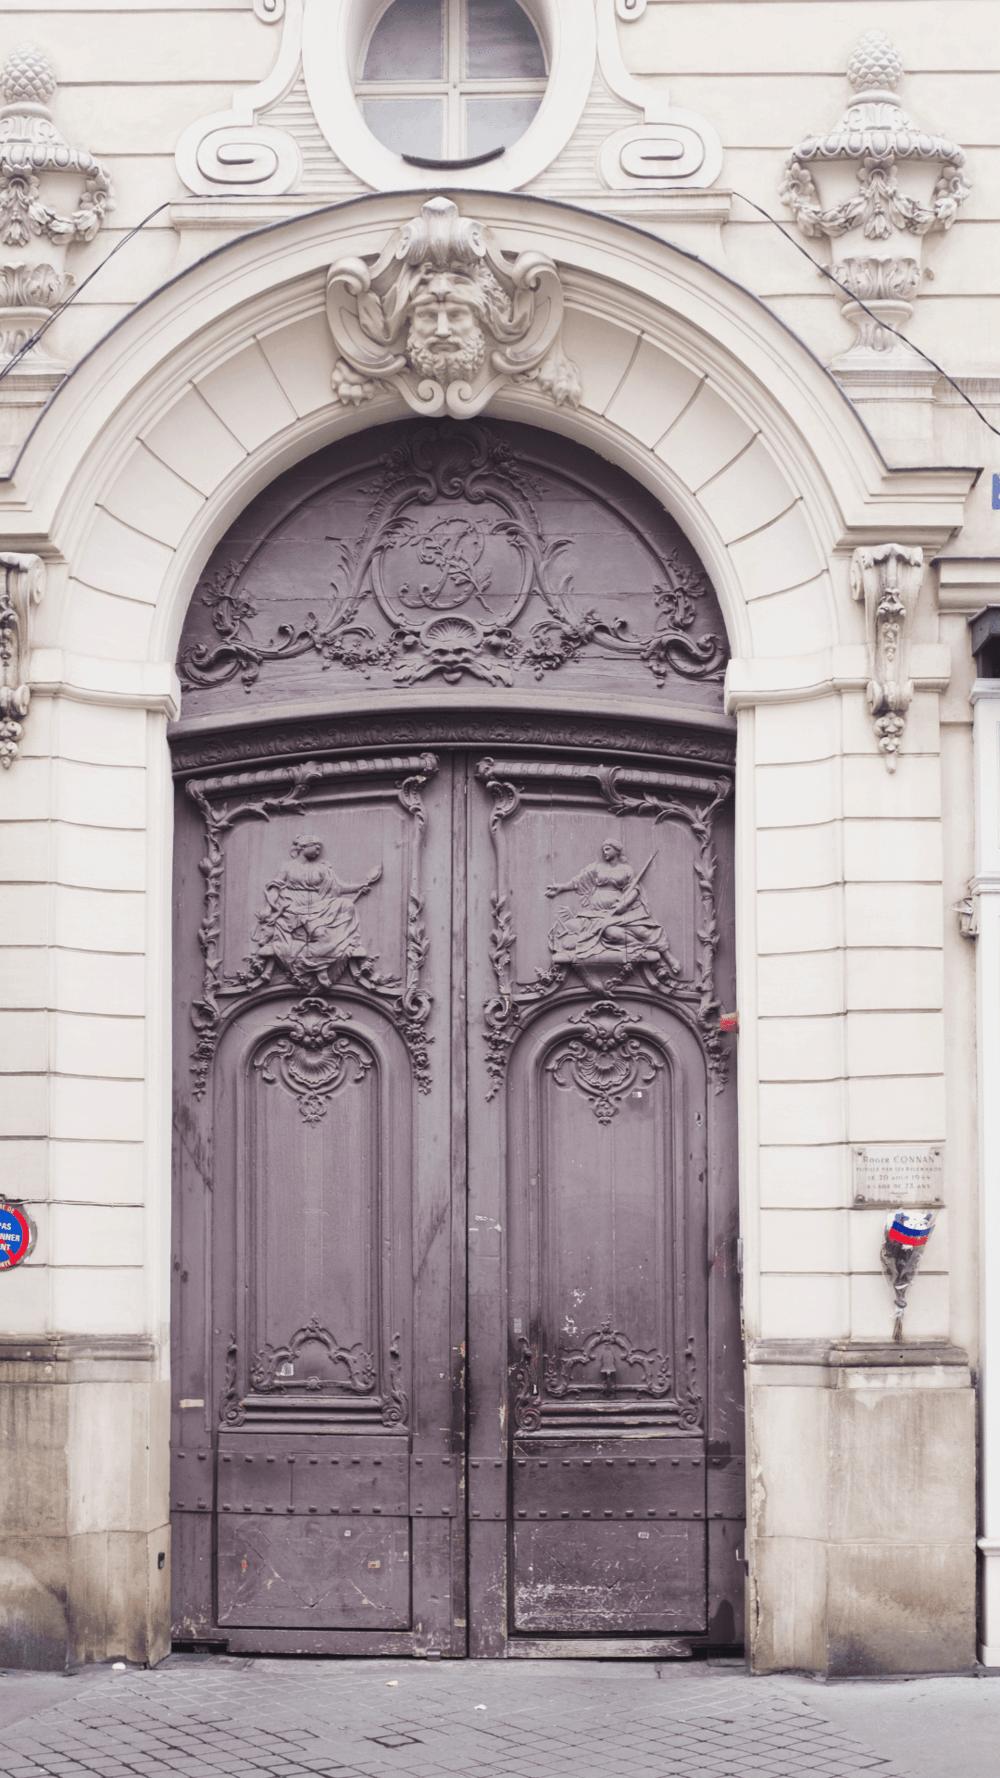 iphone Paris background everyday parisian